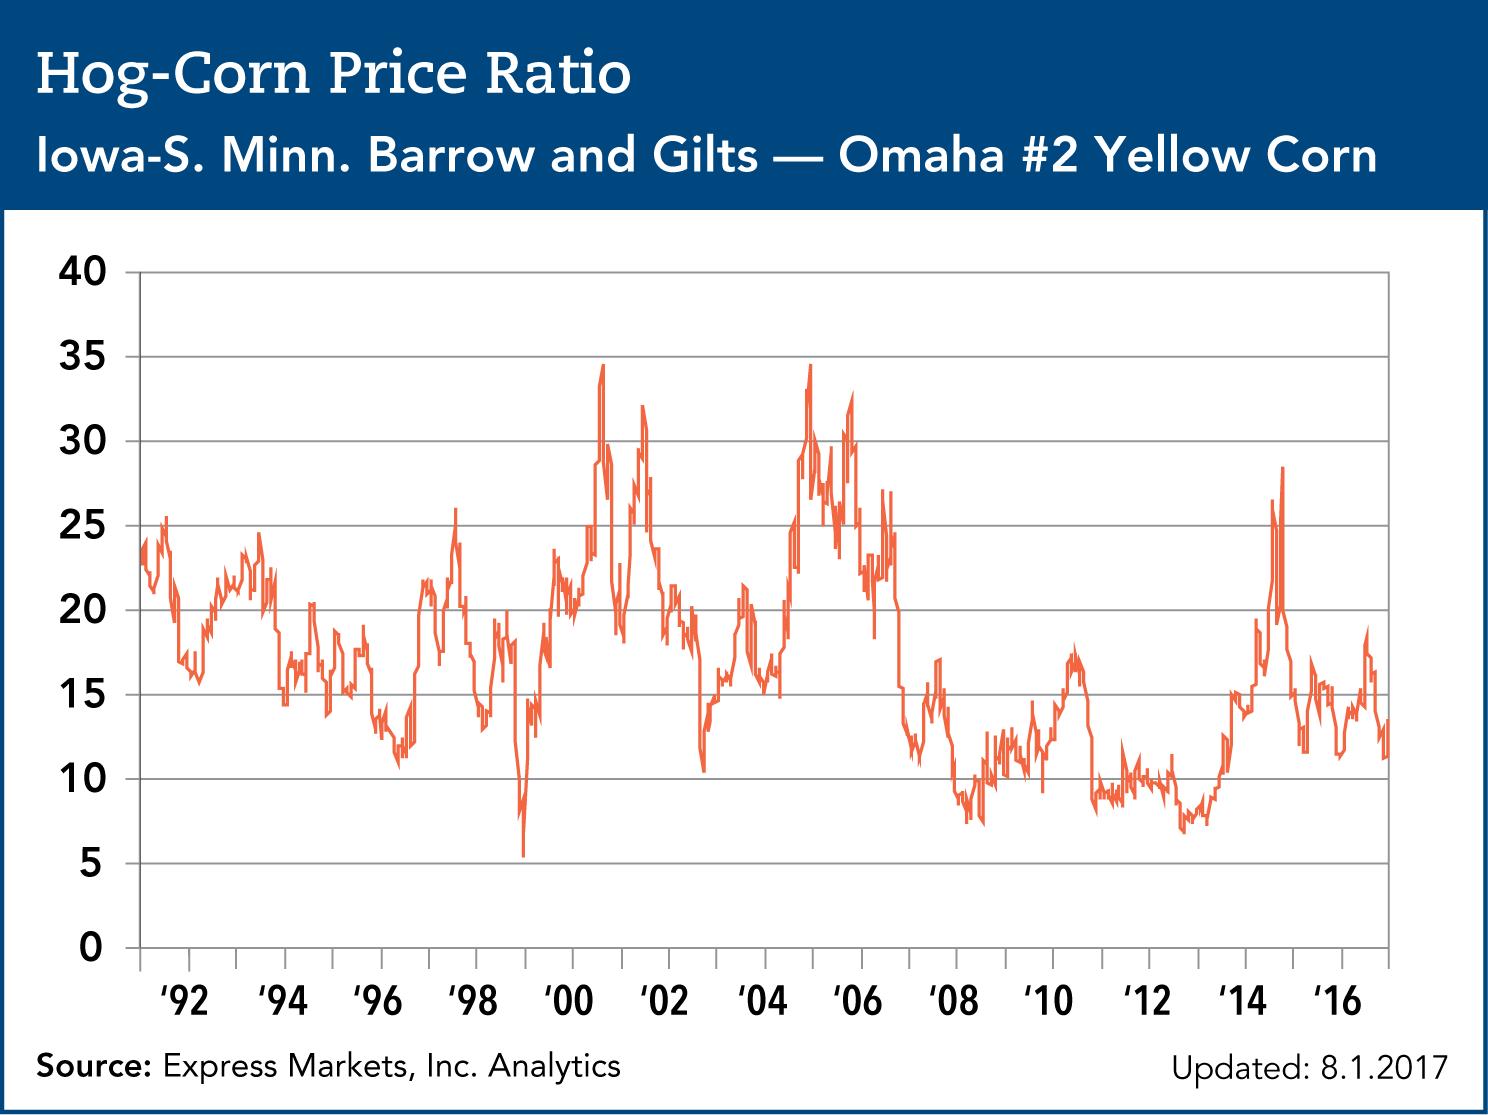 hog corn price ratio through end of 2016